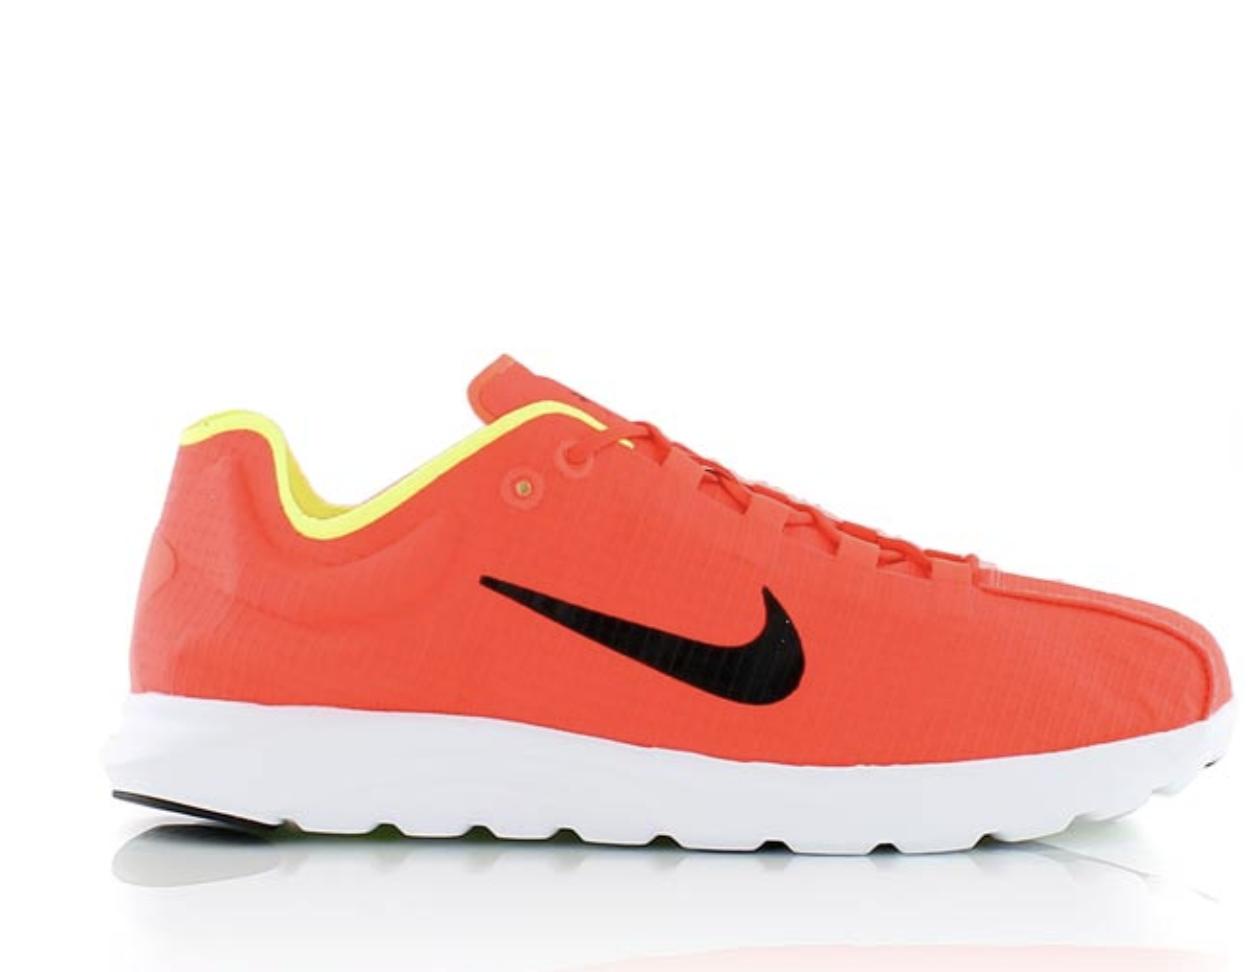 Nike Mayfly Lite SE Laufschuhe Sportschuhe Original Running Turnschuhe tn 45